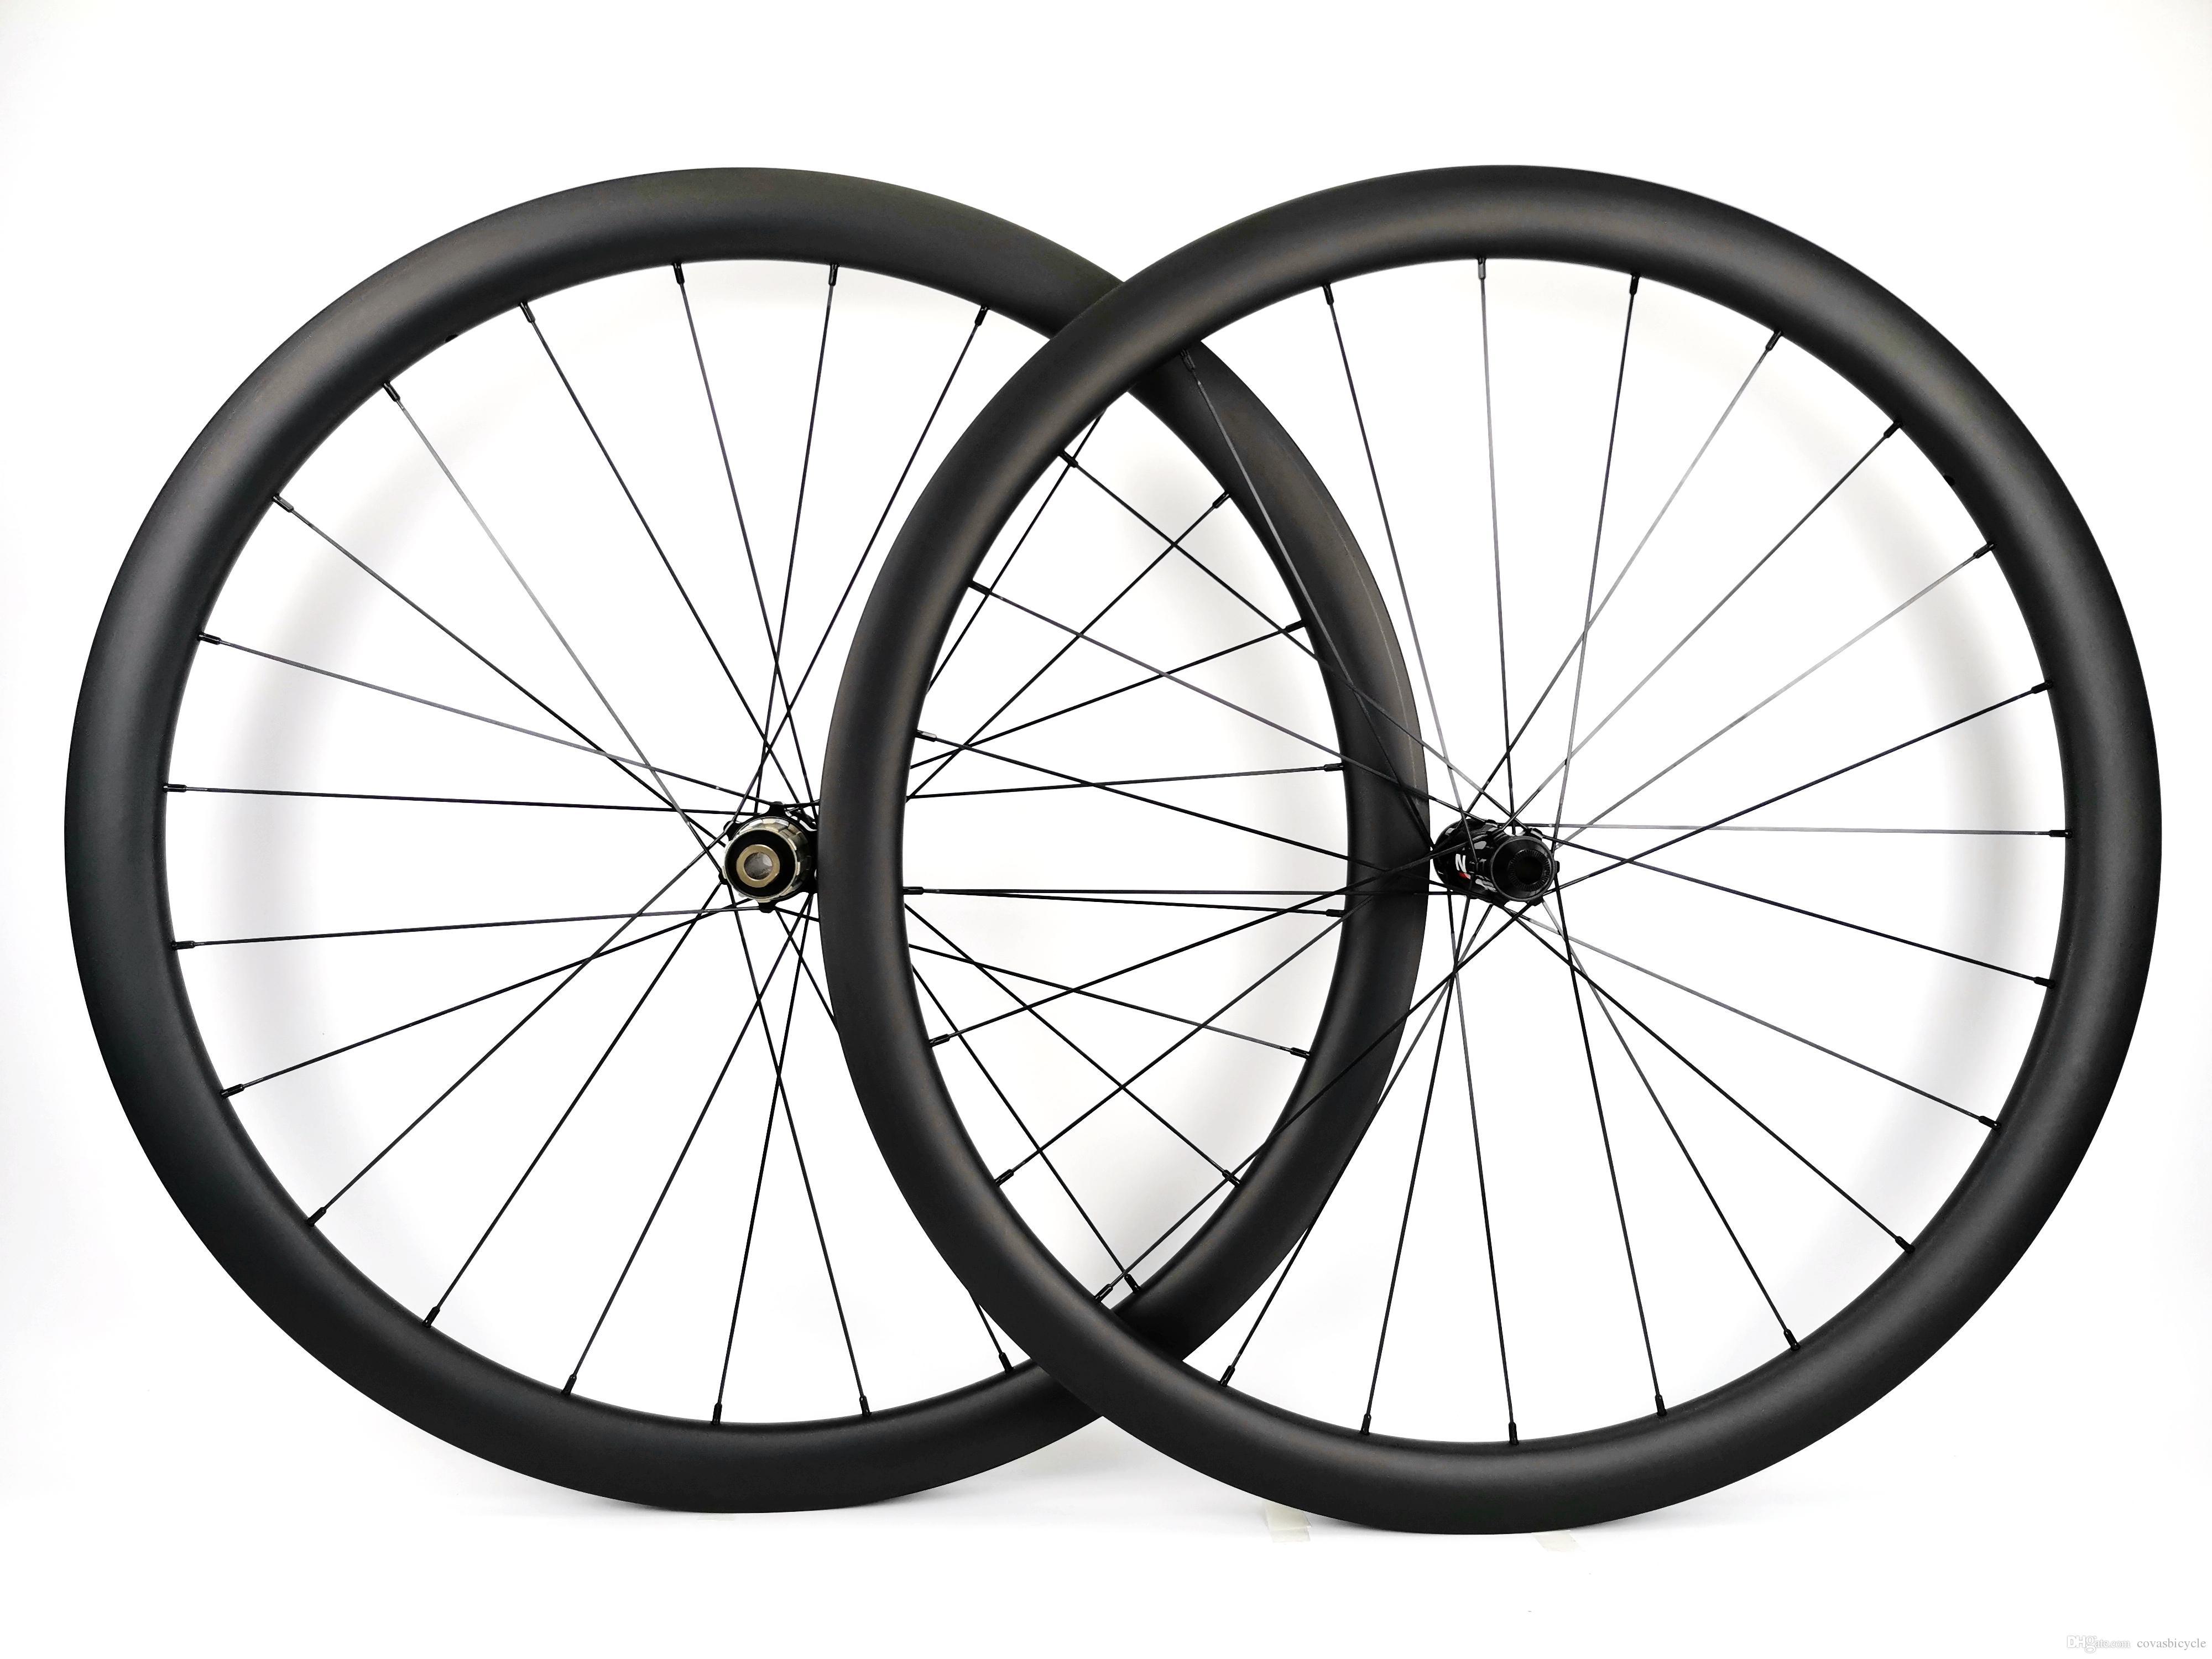 Carbon Fiber Wheels >> Full Carbon Fiber Wheels 700c 38mm Depth 25mm Width Clincher Tubular Road Disc Brake Bike Wheelset Ud Matte Finish Touring Bike Wheels Bike Training